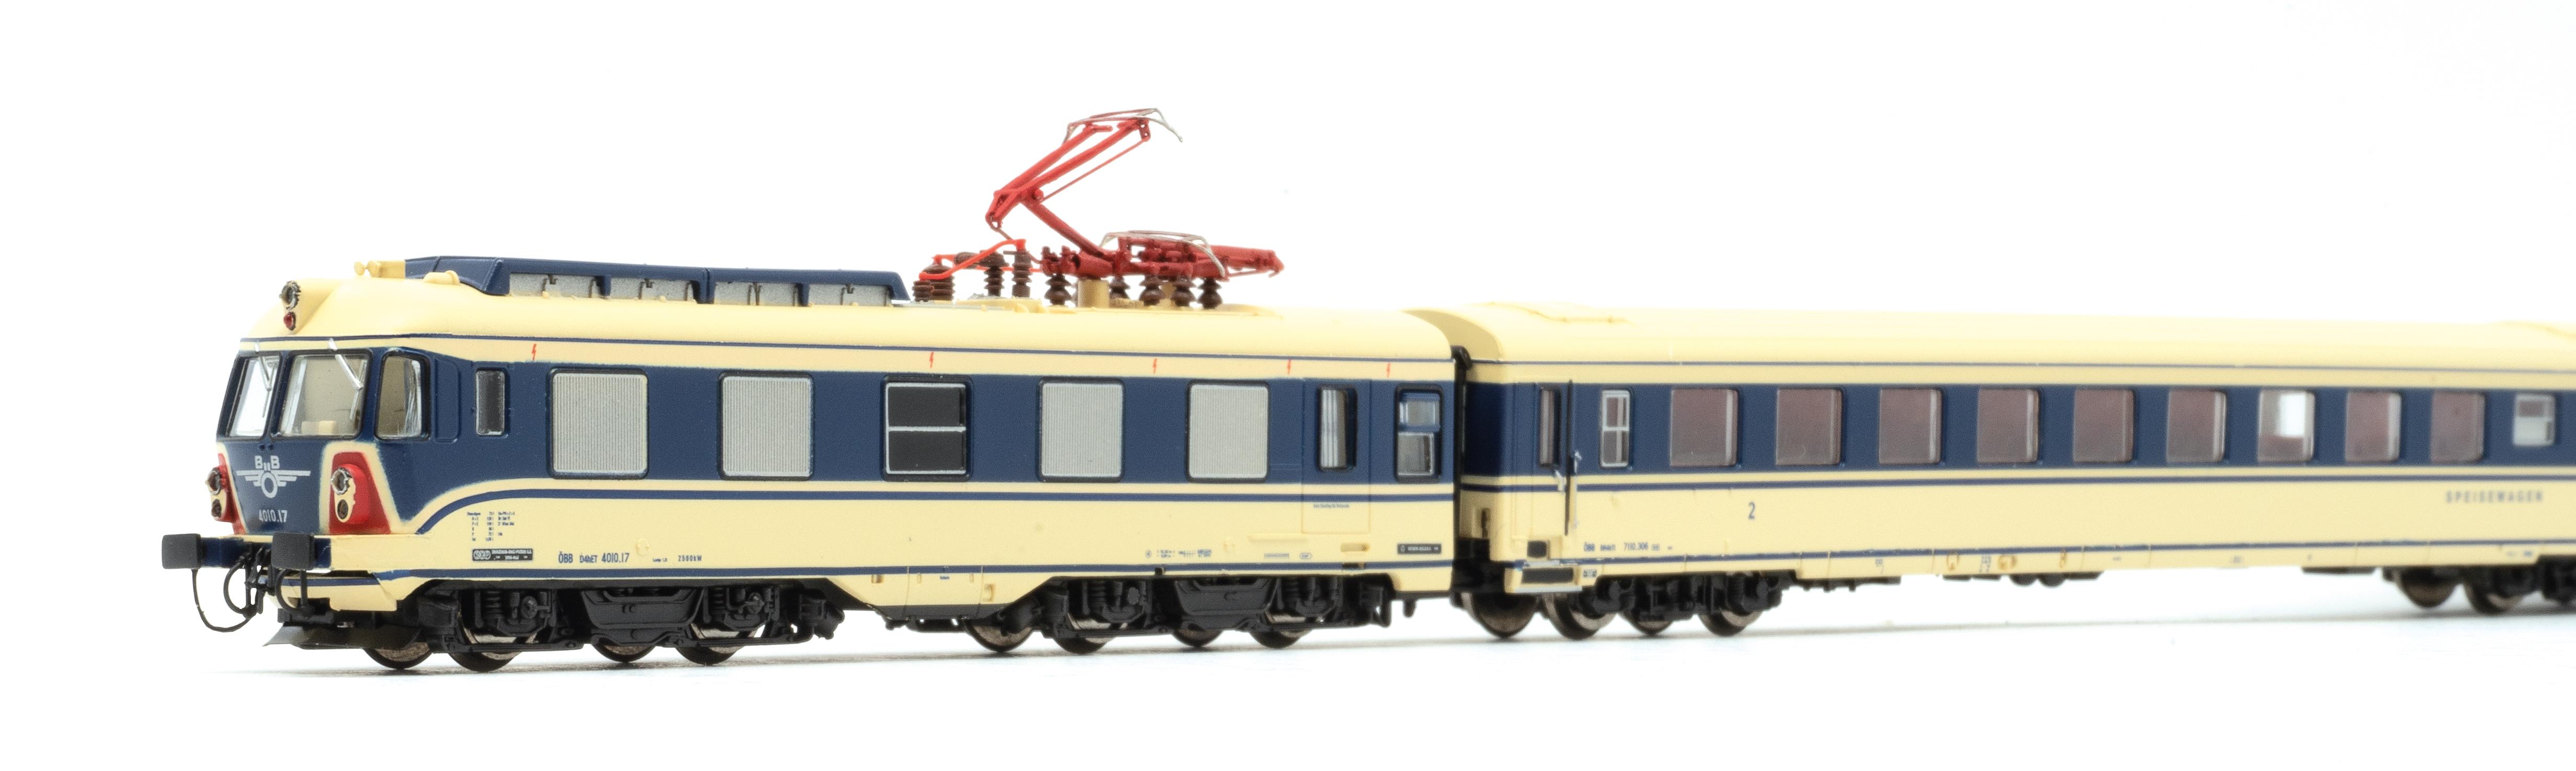 JC74310